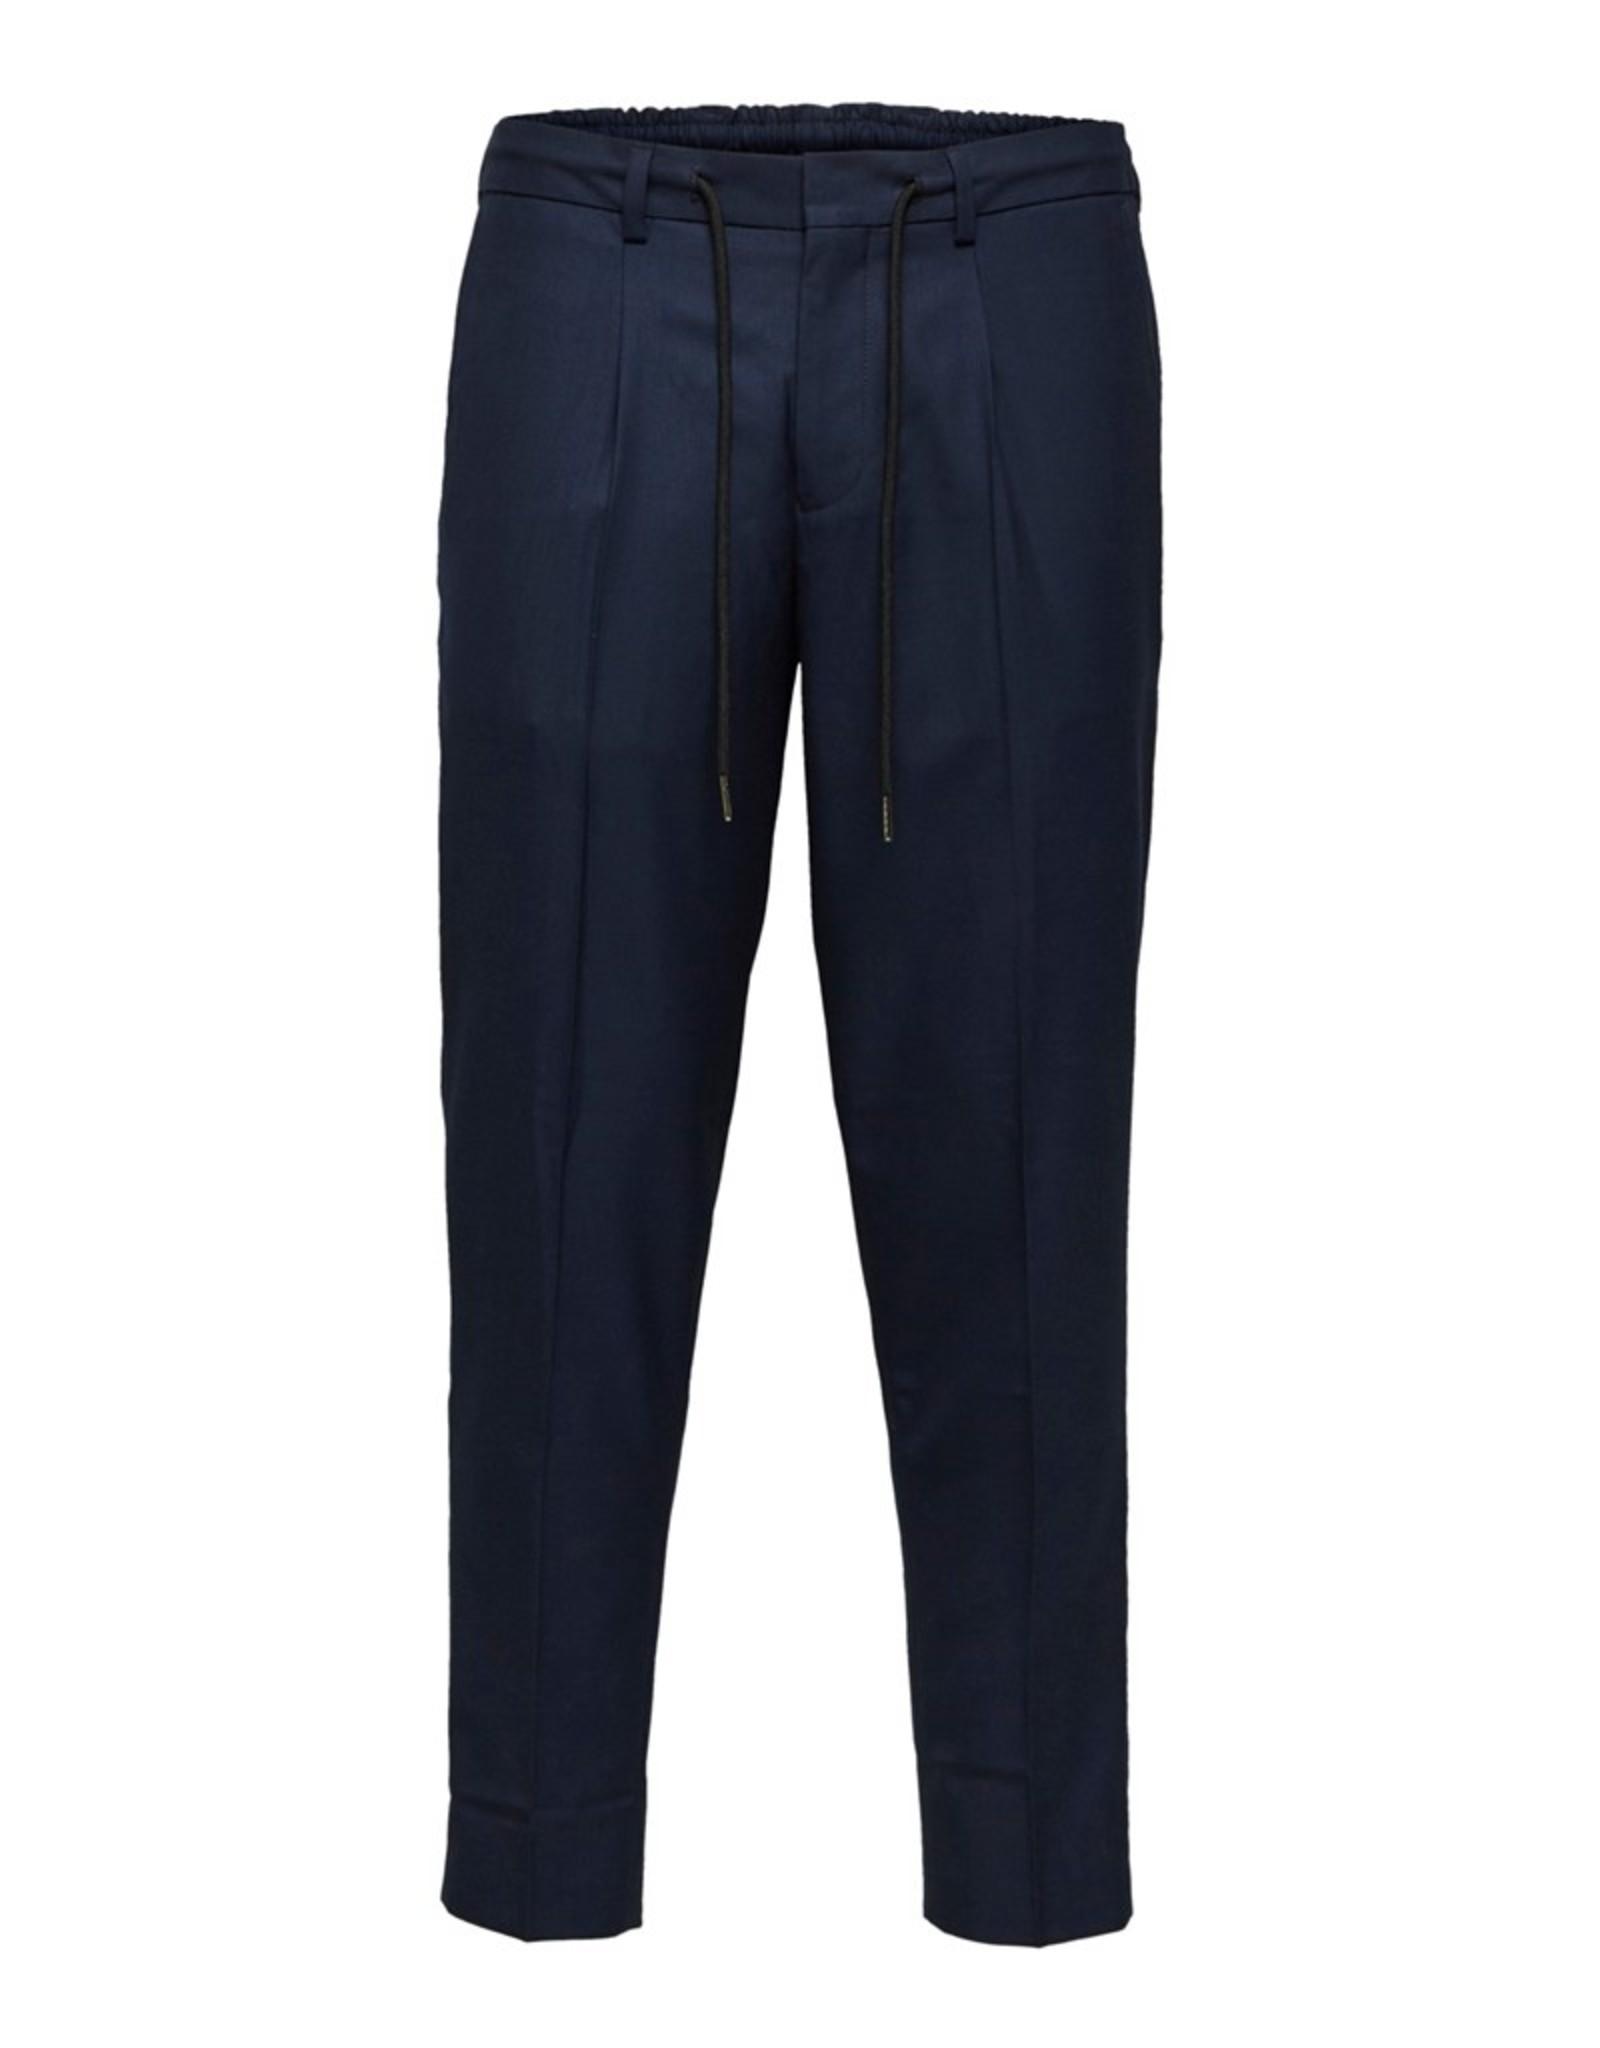 Selected Homme SS21-11-SE-Jax Crop Pants 76931